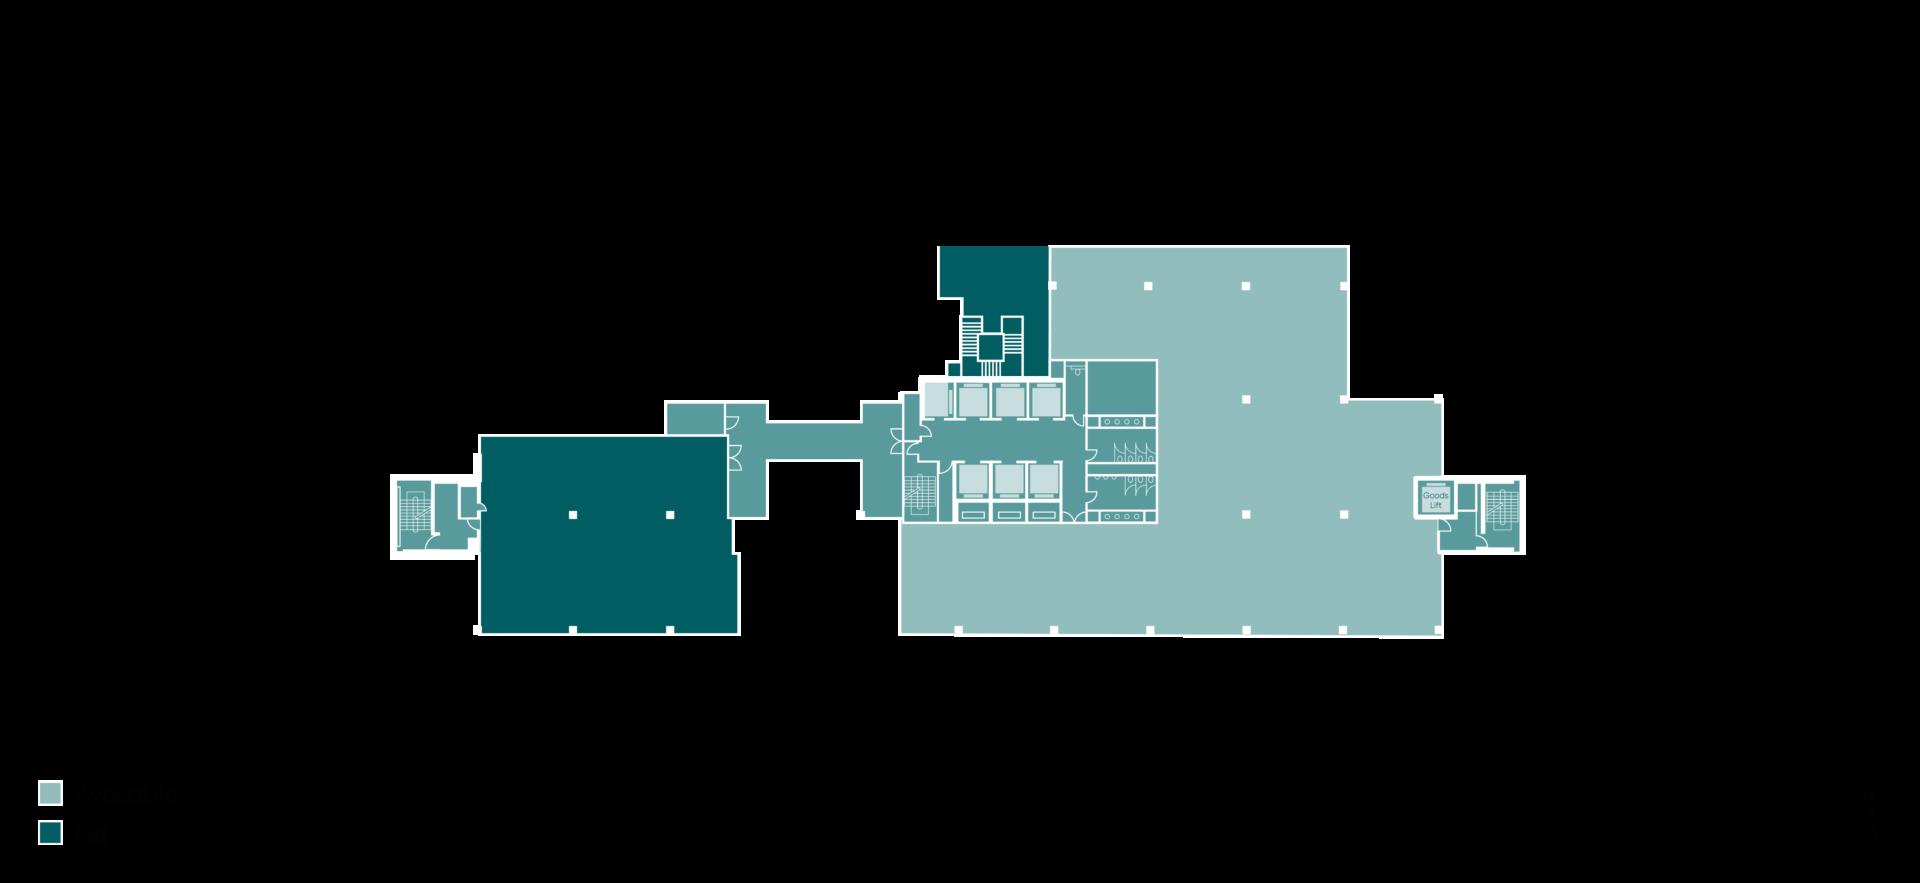 Floorplan of HX2 level 1